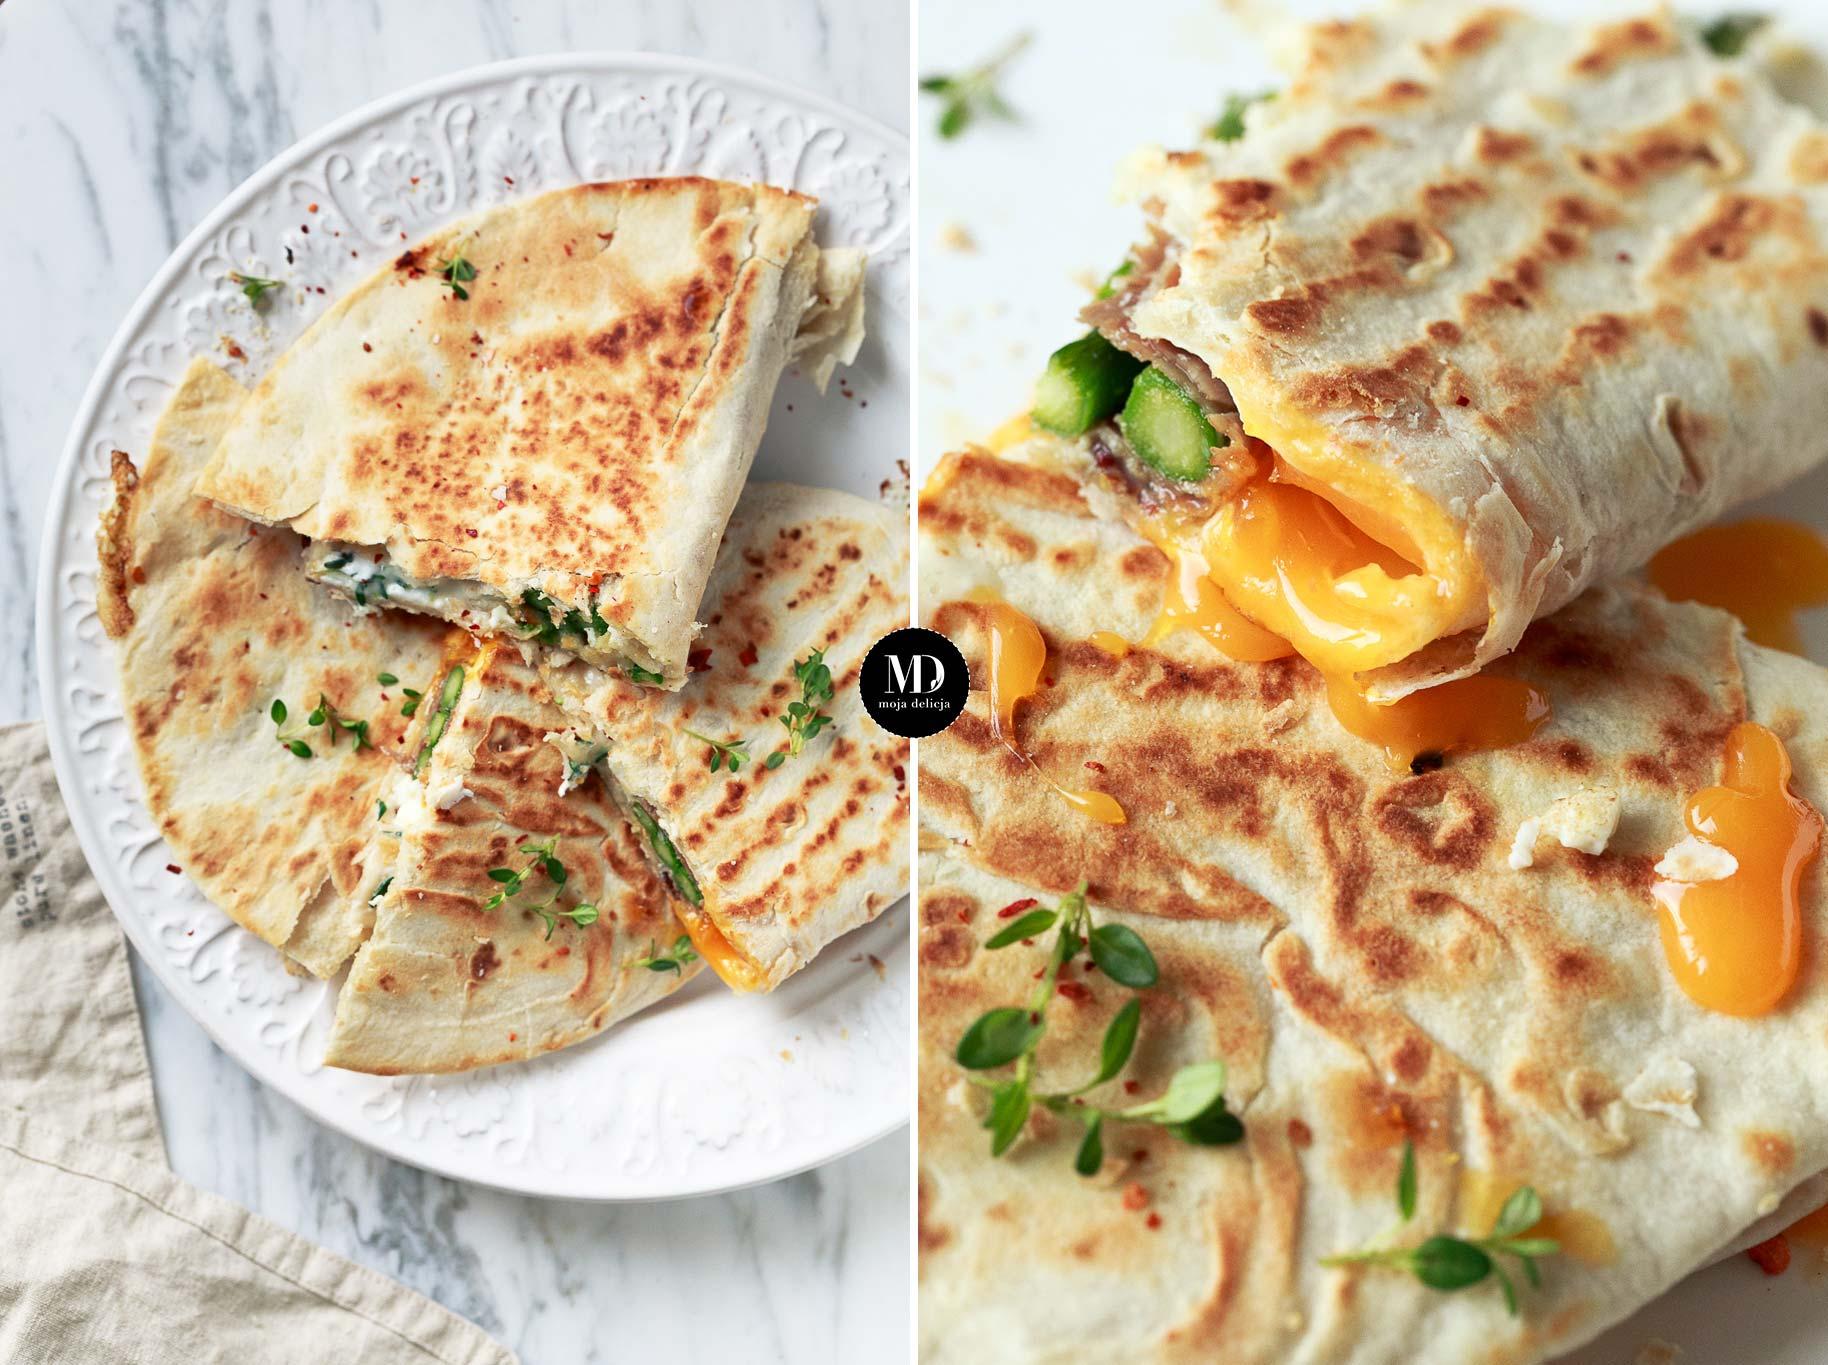 Tortilla ze szparagami, szynką i jajkiem